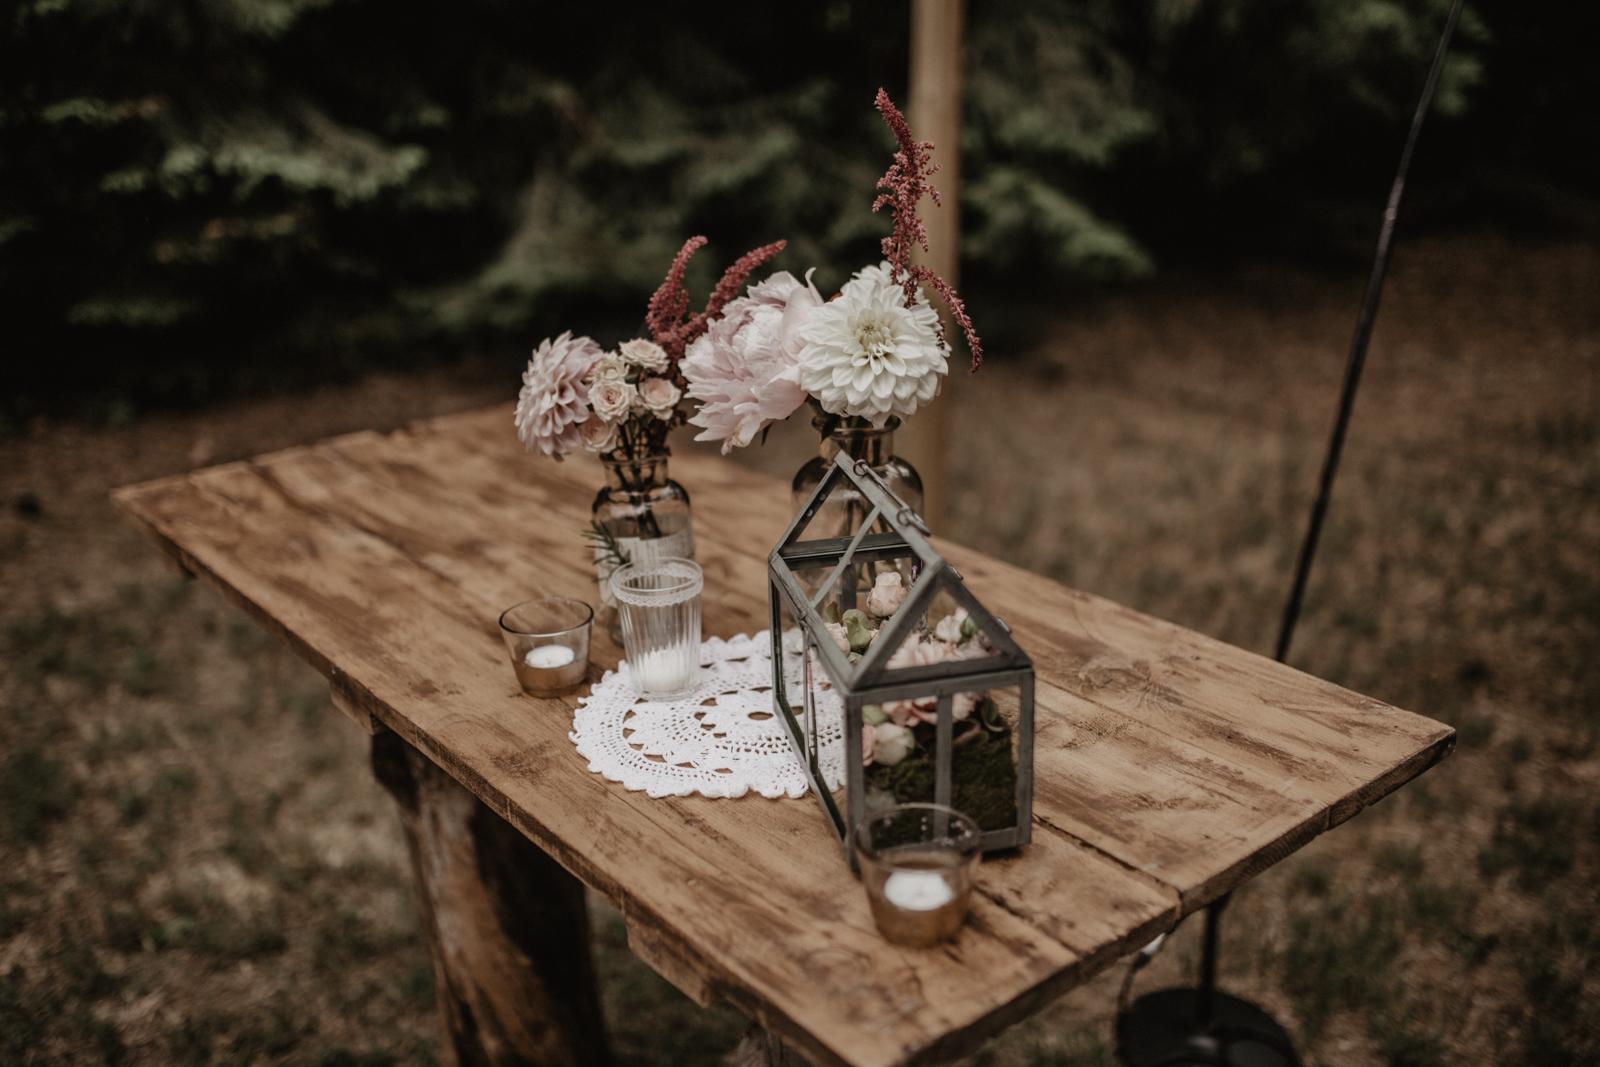 thenortherngirlphotography_photography_thenortherngirl_rebeccascabros_wedding_weddingphotography_weddingphotographer_barcelona_bodaenbarcelona_bodaenmaselmarti_bodarogeryvane-242.jpg